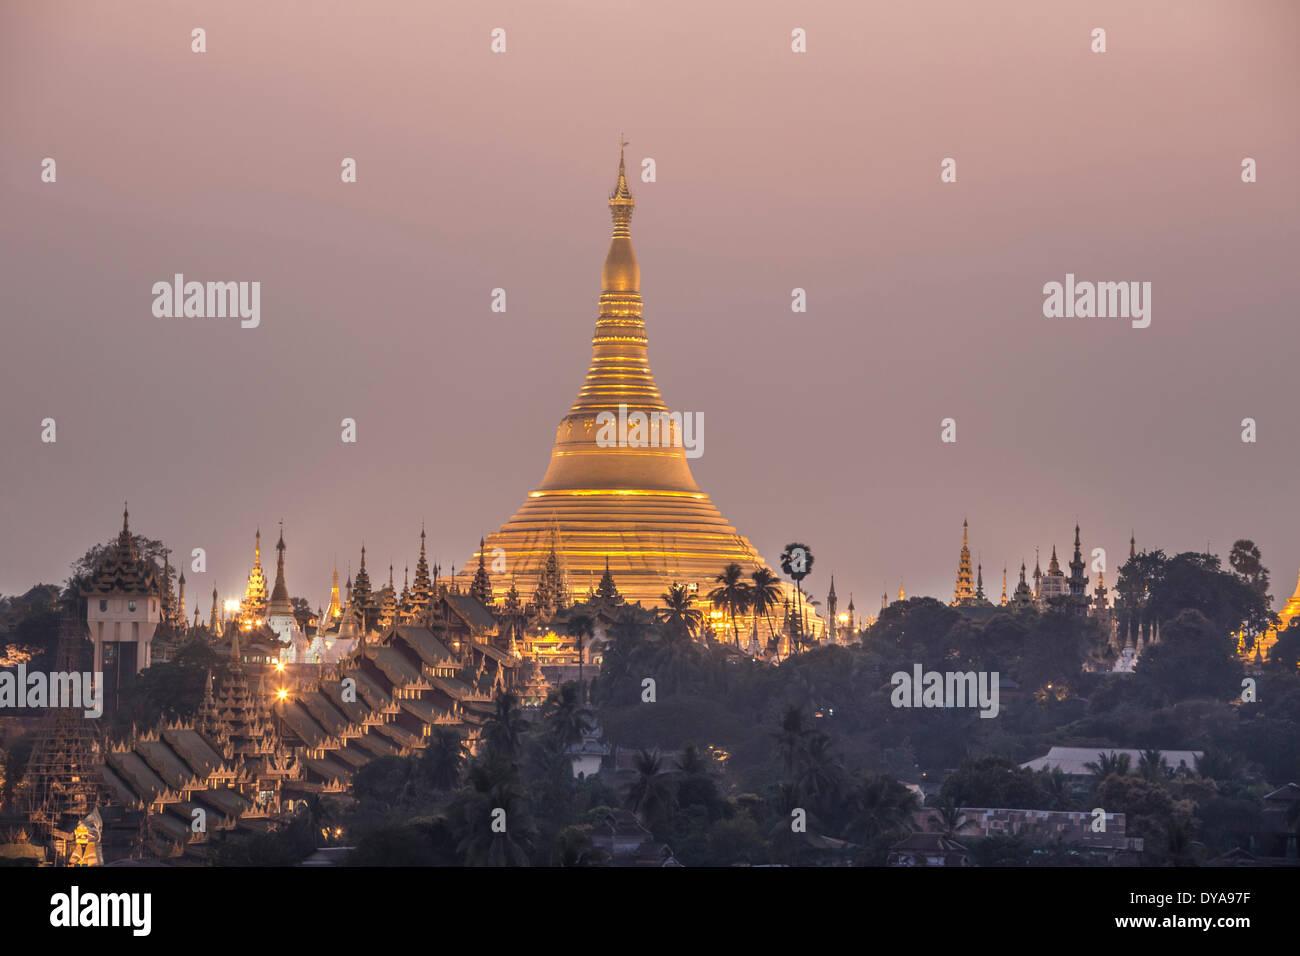 Myanmar, Burma, Asia, Yangon, Rangoon, Shwedagon, Pagoda, religion, golden, landmark, evening Stock Photo